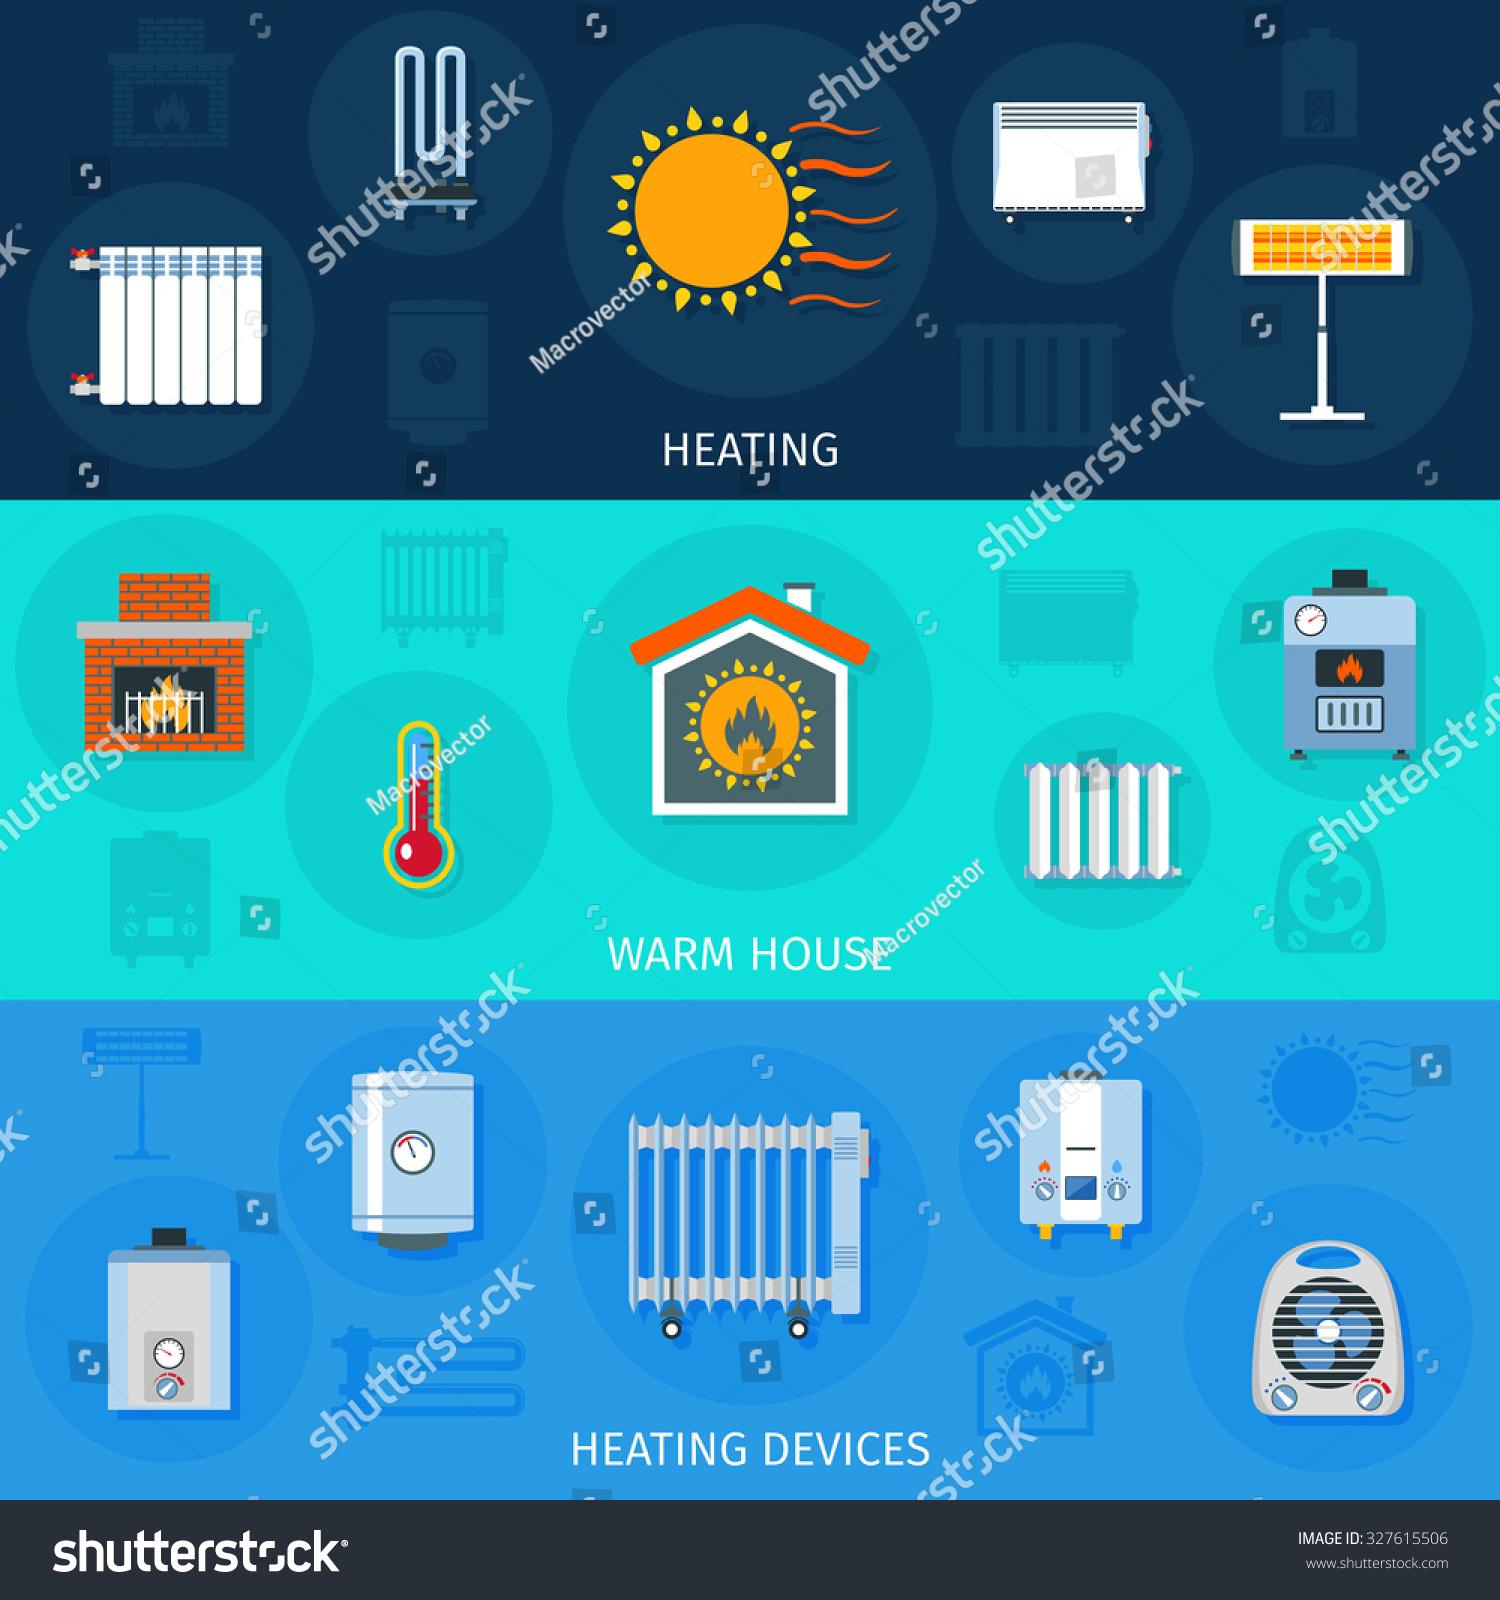 Warm House System Heating Devices Symbols Stock Illustration ...